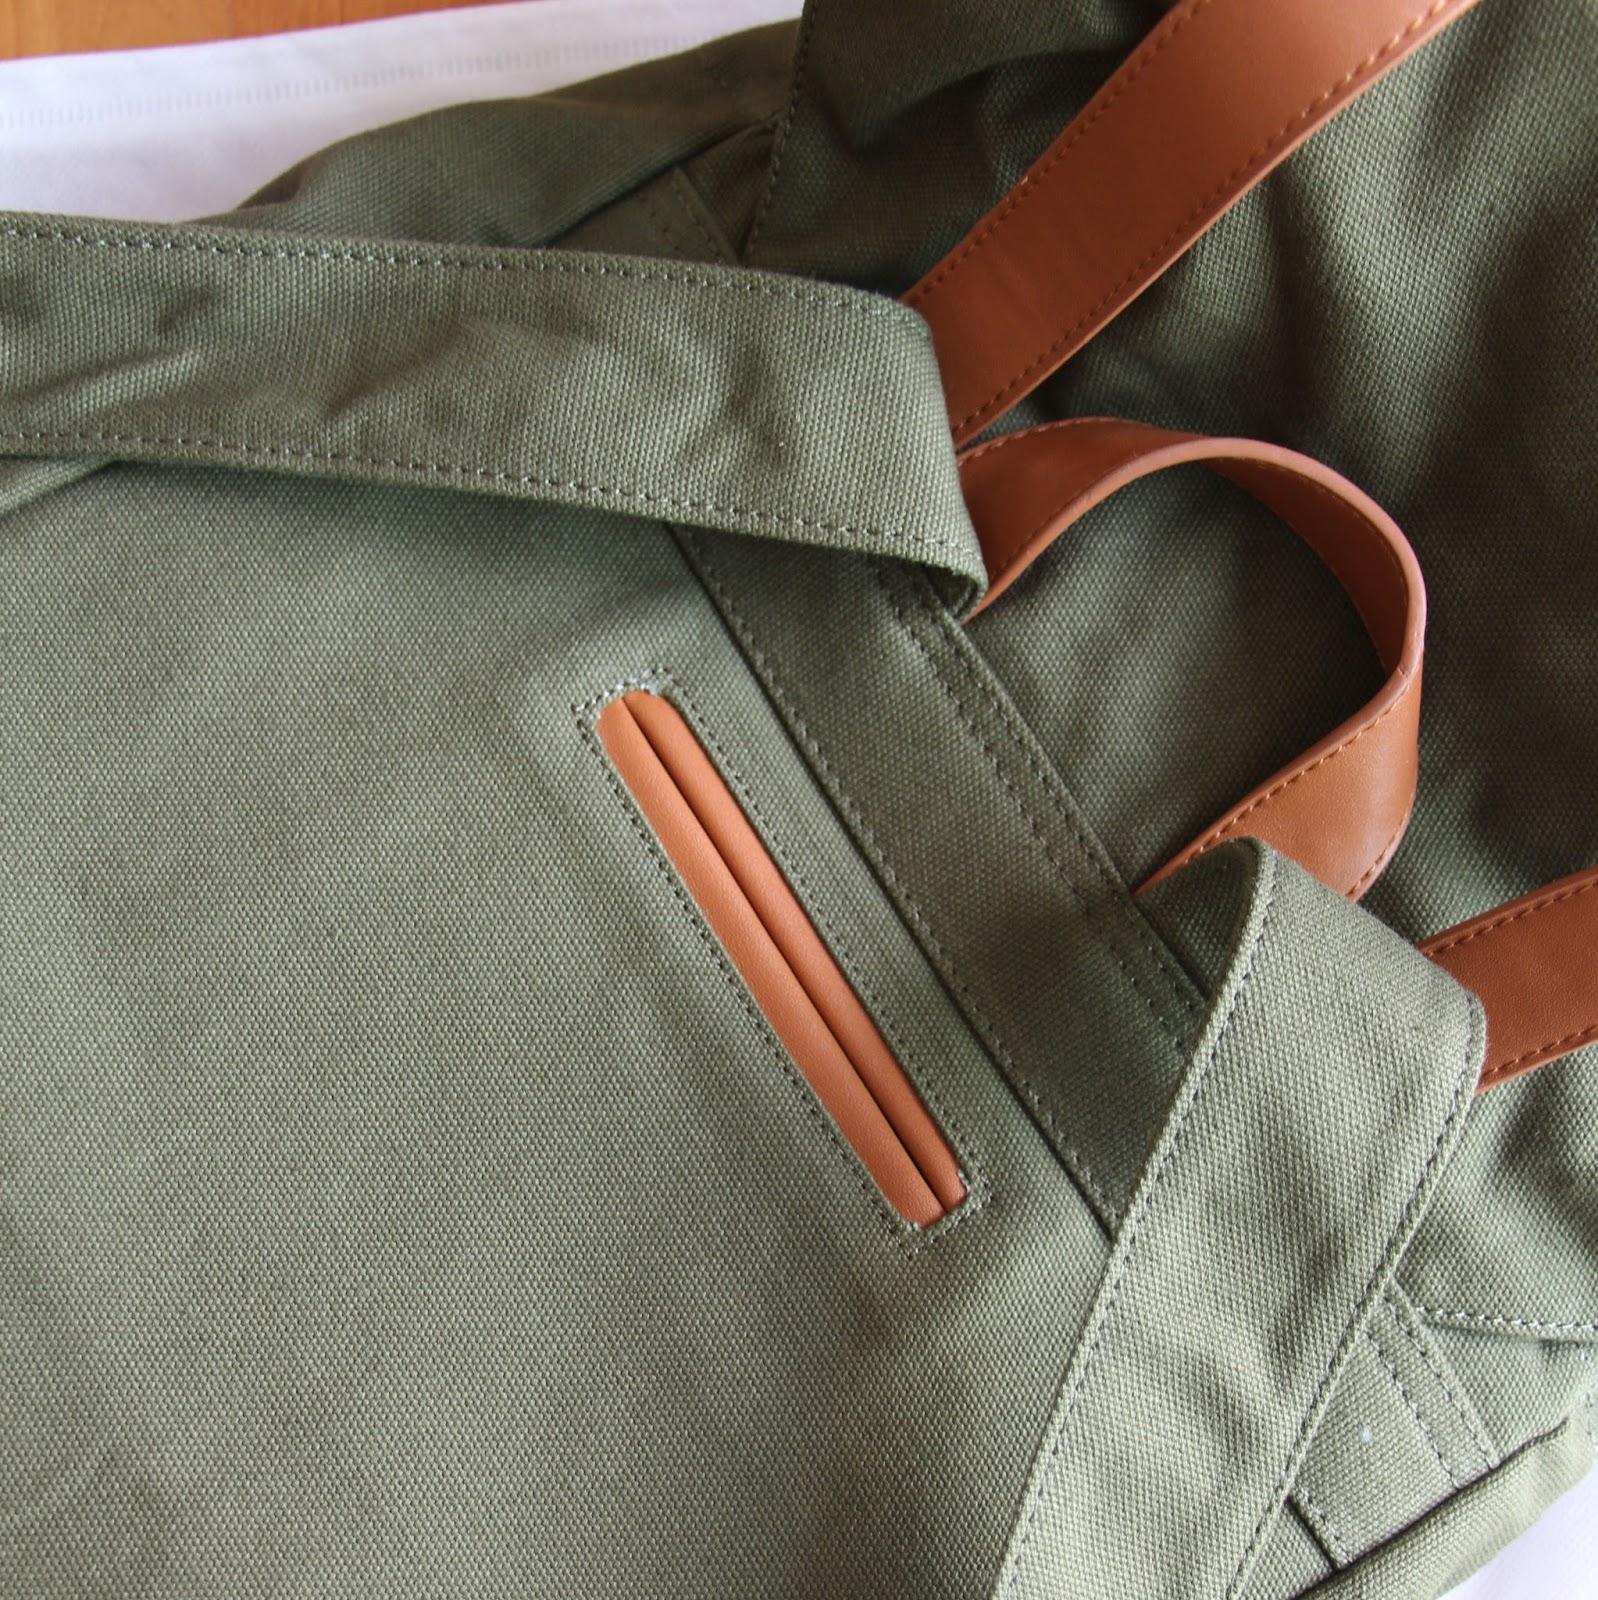 Best Laptop Backpack For Travel Uk